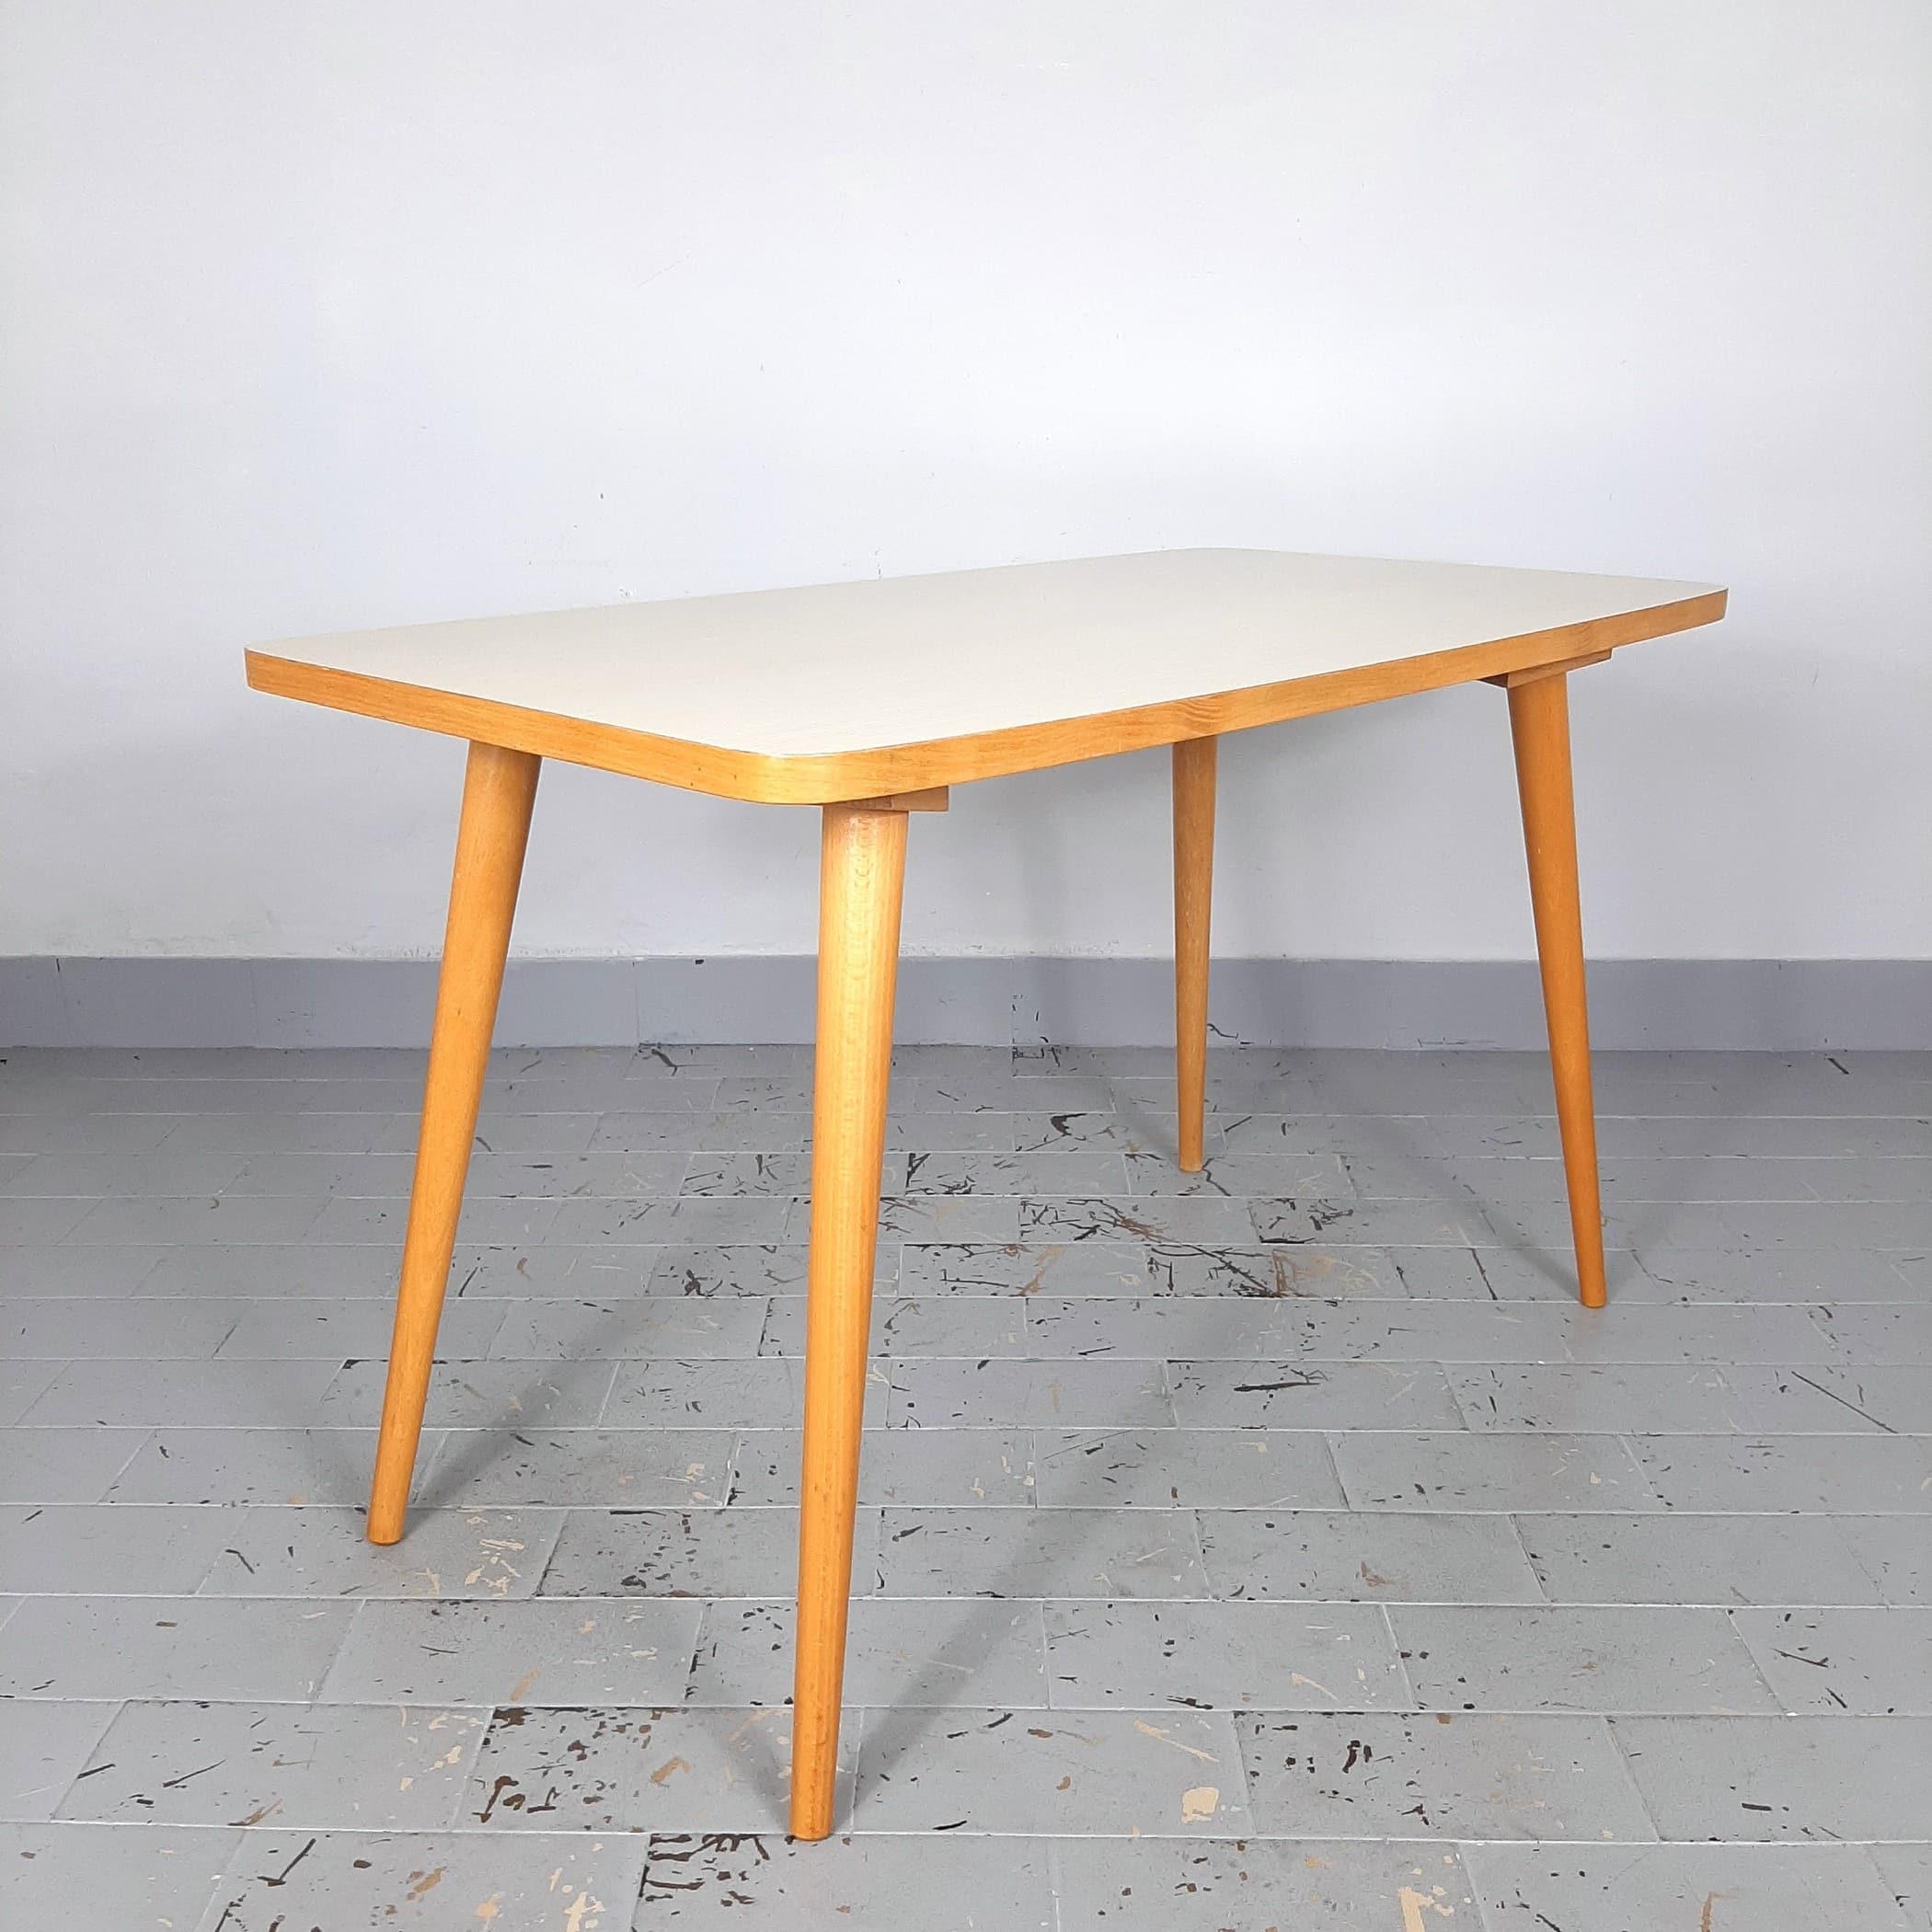 1 of 2 Retro coffee table Yugoslavia '60s MCM furniture vintage modern retro